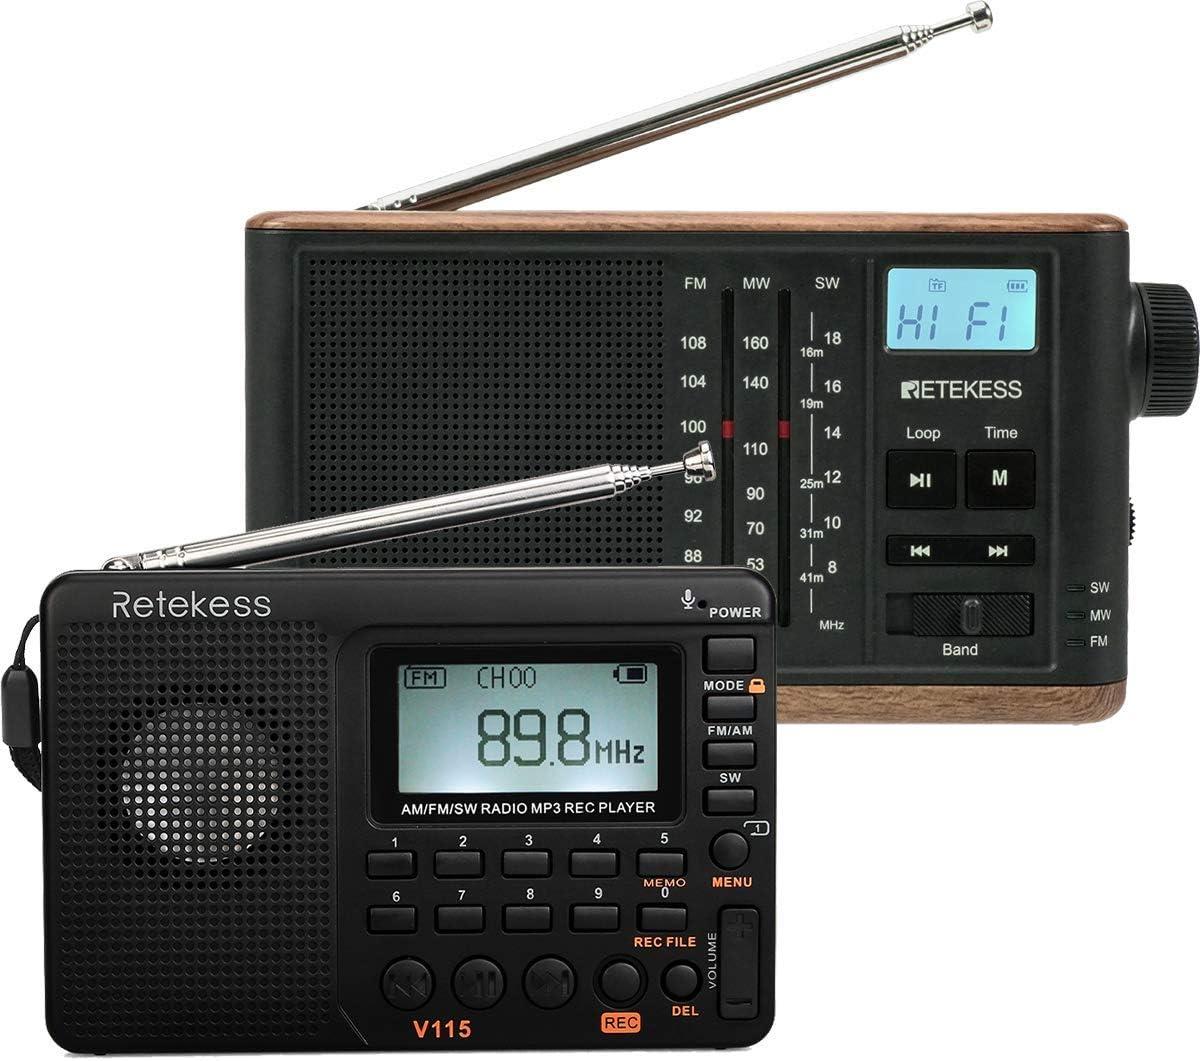 Retekess V115 Shortwave Radio, Portable Radio AM FM with Bass Sound, and TR613 AM FM Shortwave Radio, Portable Tabletop Radio, Retro MP3 Radio (Bundle)